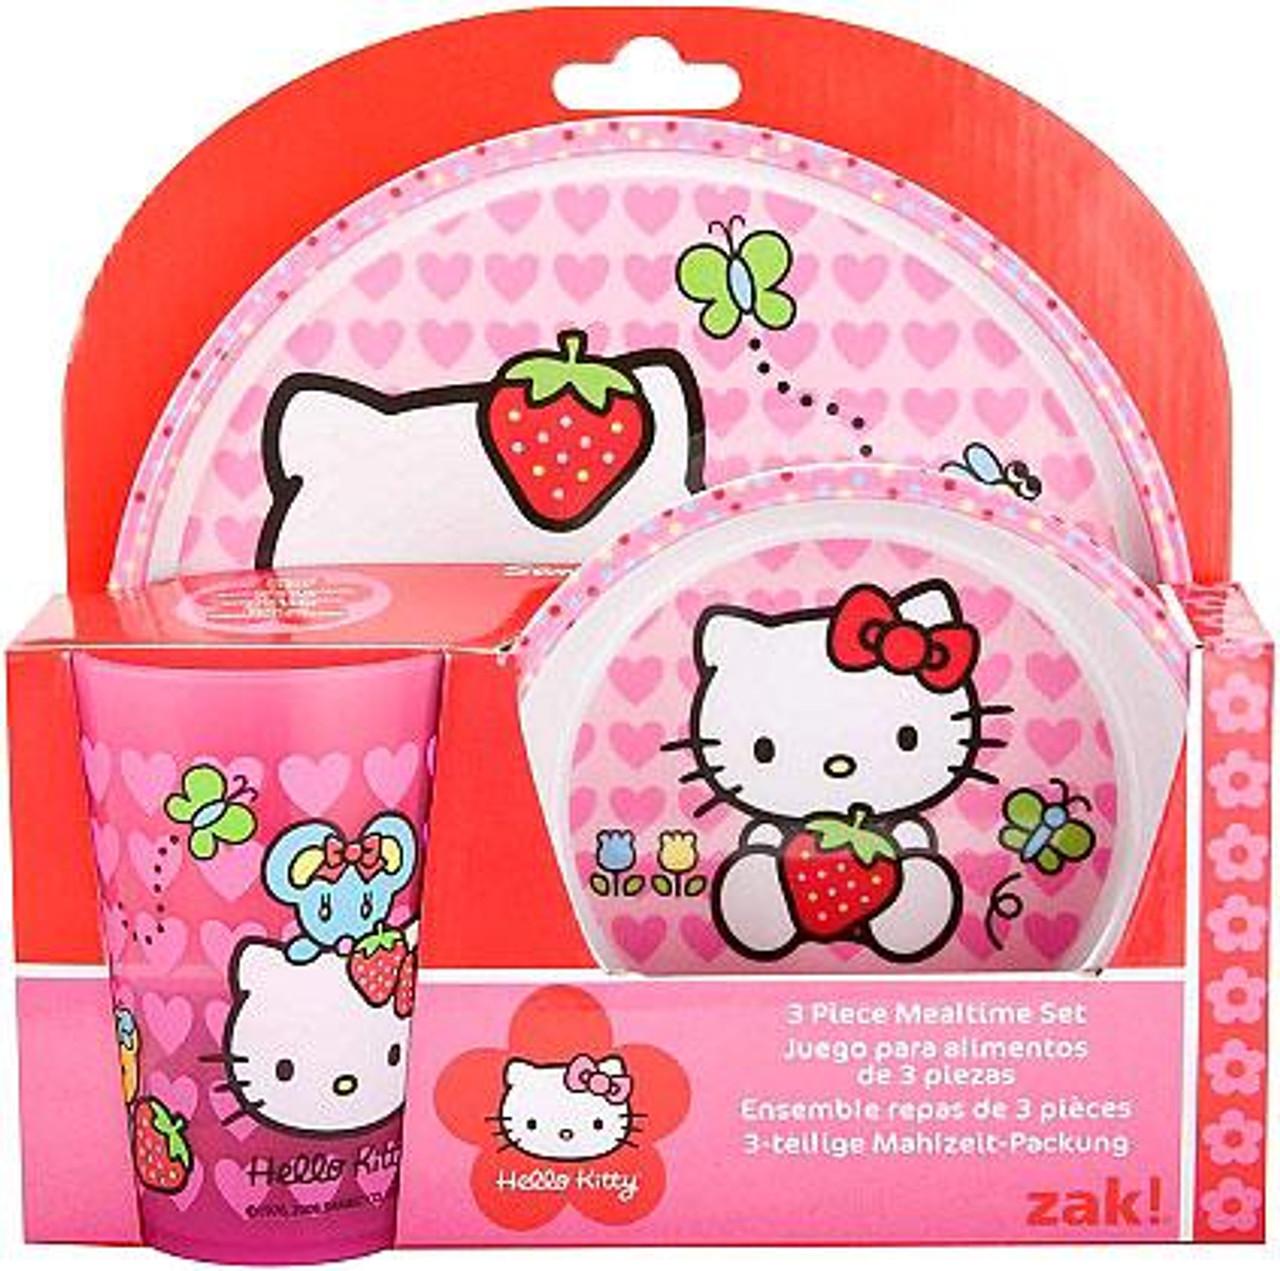 Hello Kitty 3-Piece Mealtime Set [Plate, Bowl & Tumbler]